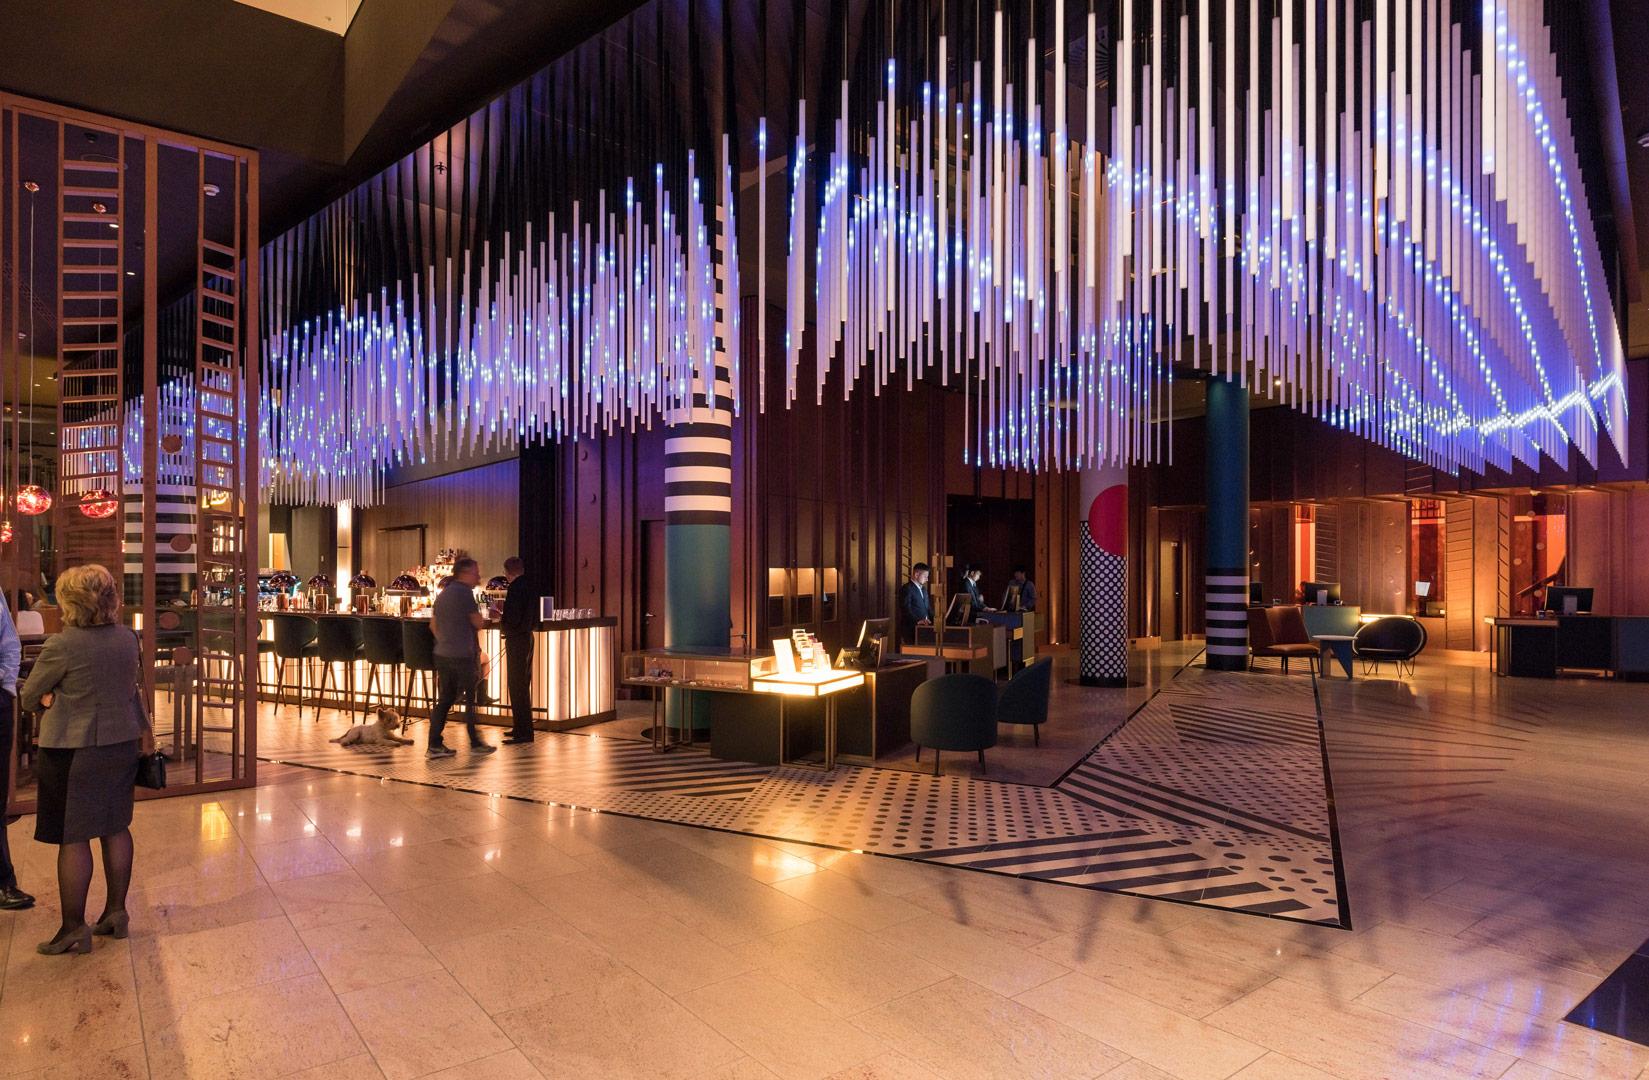 Hotel Pullmann Berlin Schweizer Hof_Lichtskulptur_Kardorff Lichtplanung